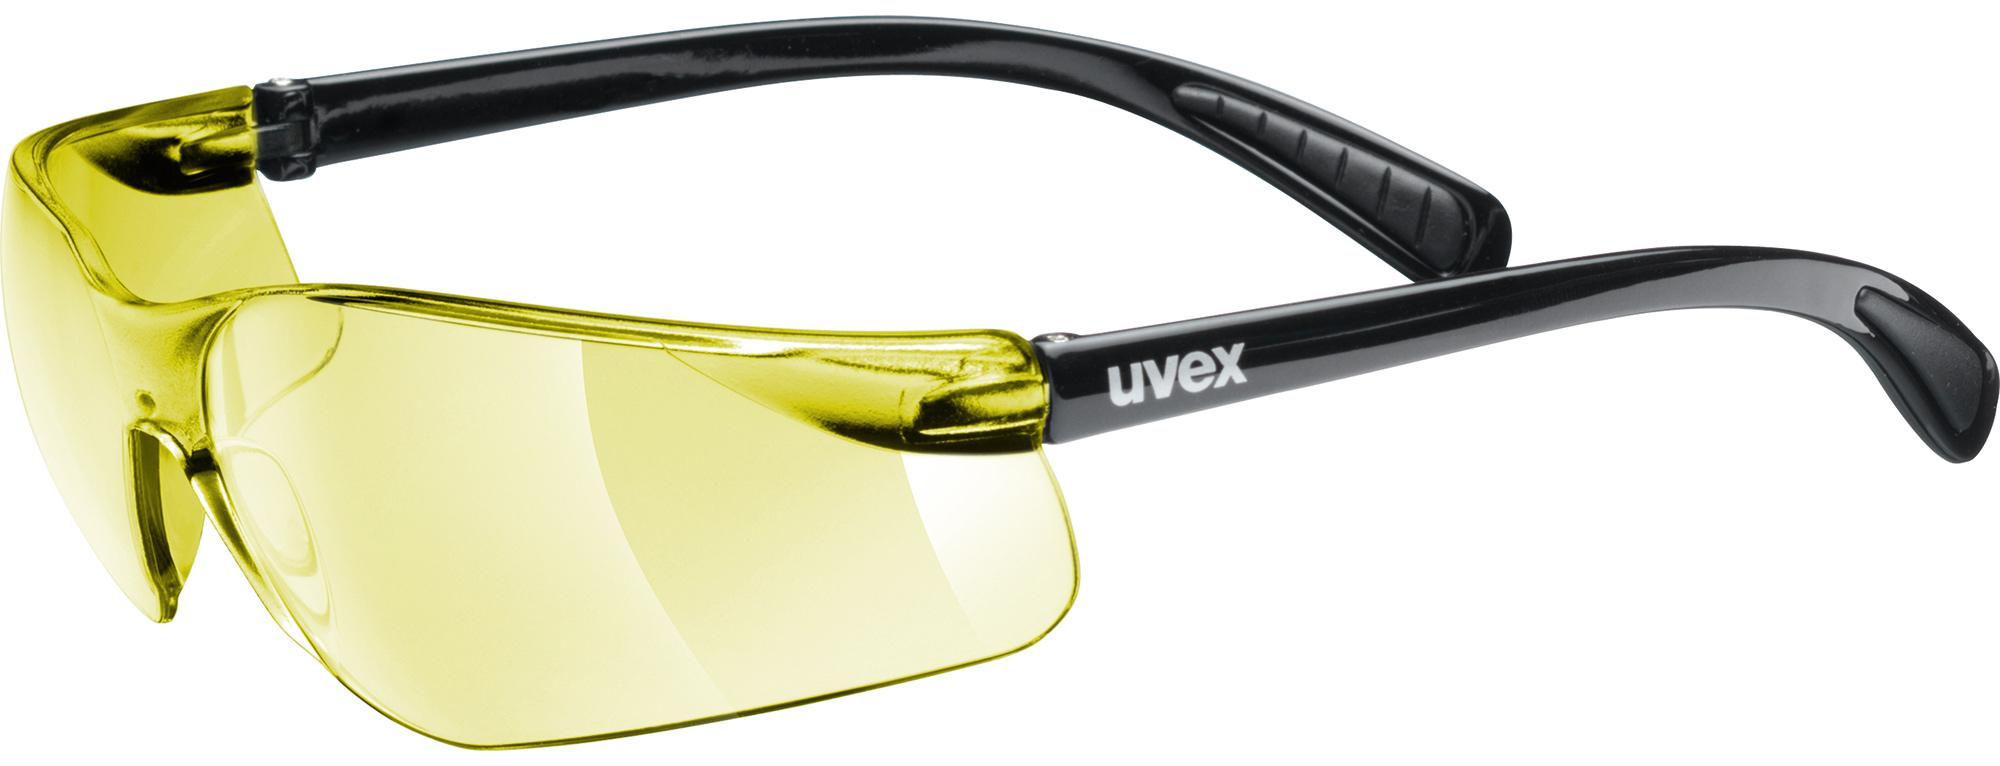 Uvex Солнцезащитные очки Uvex Flash